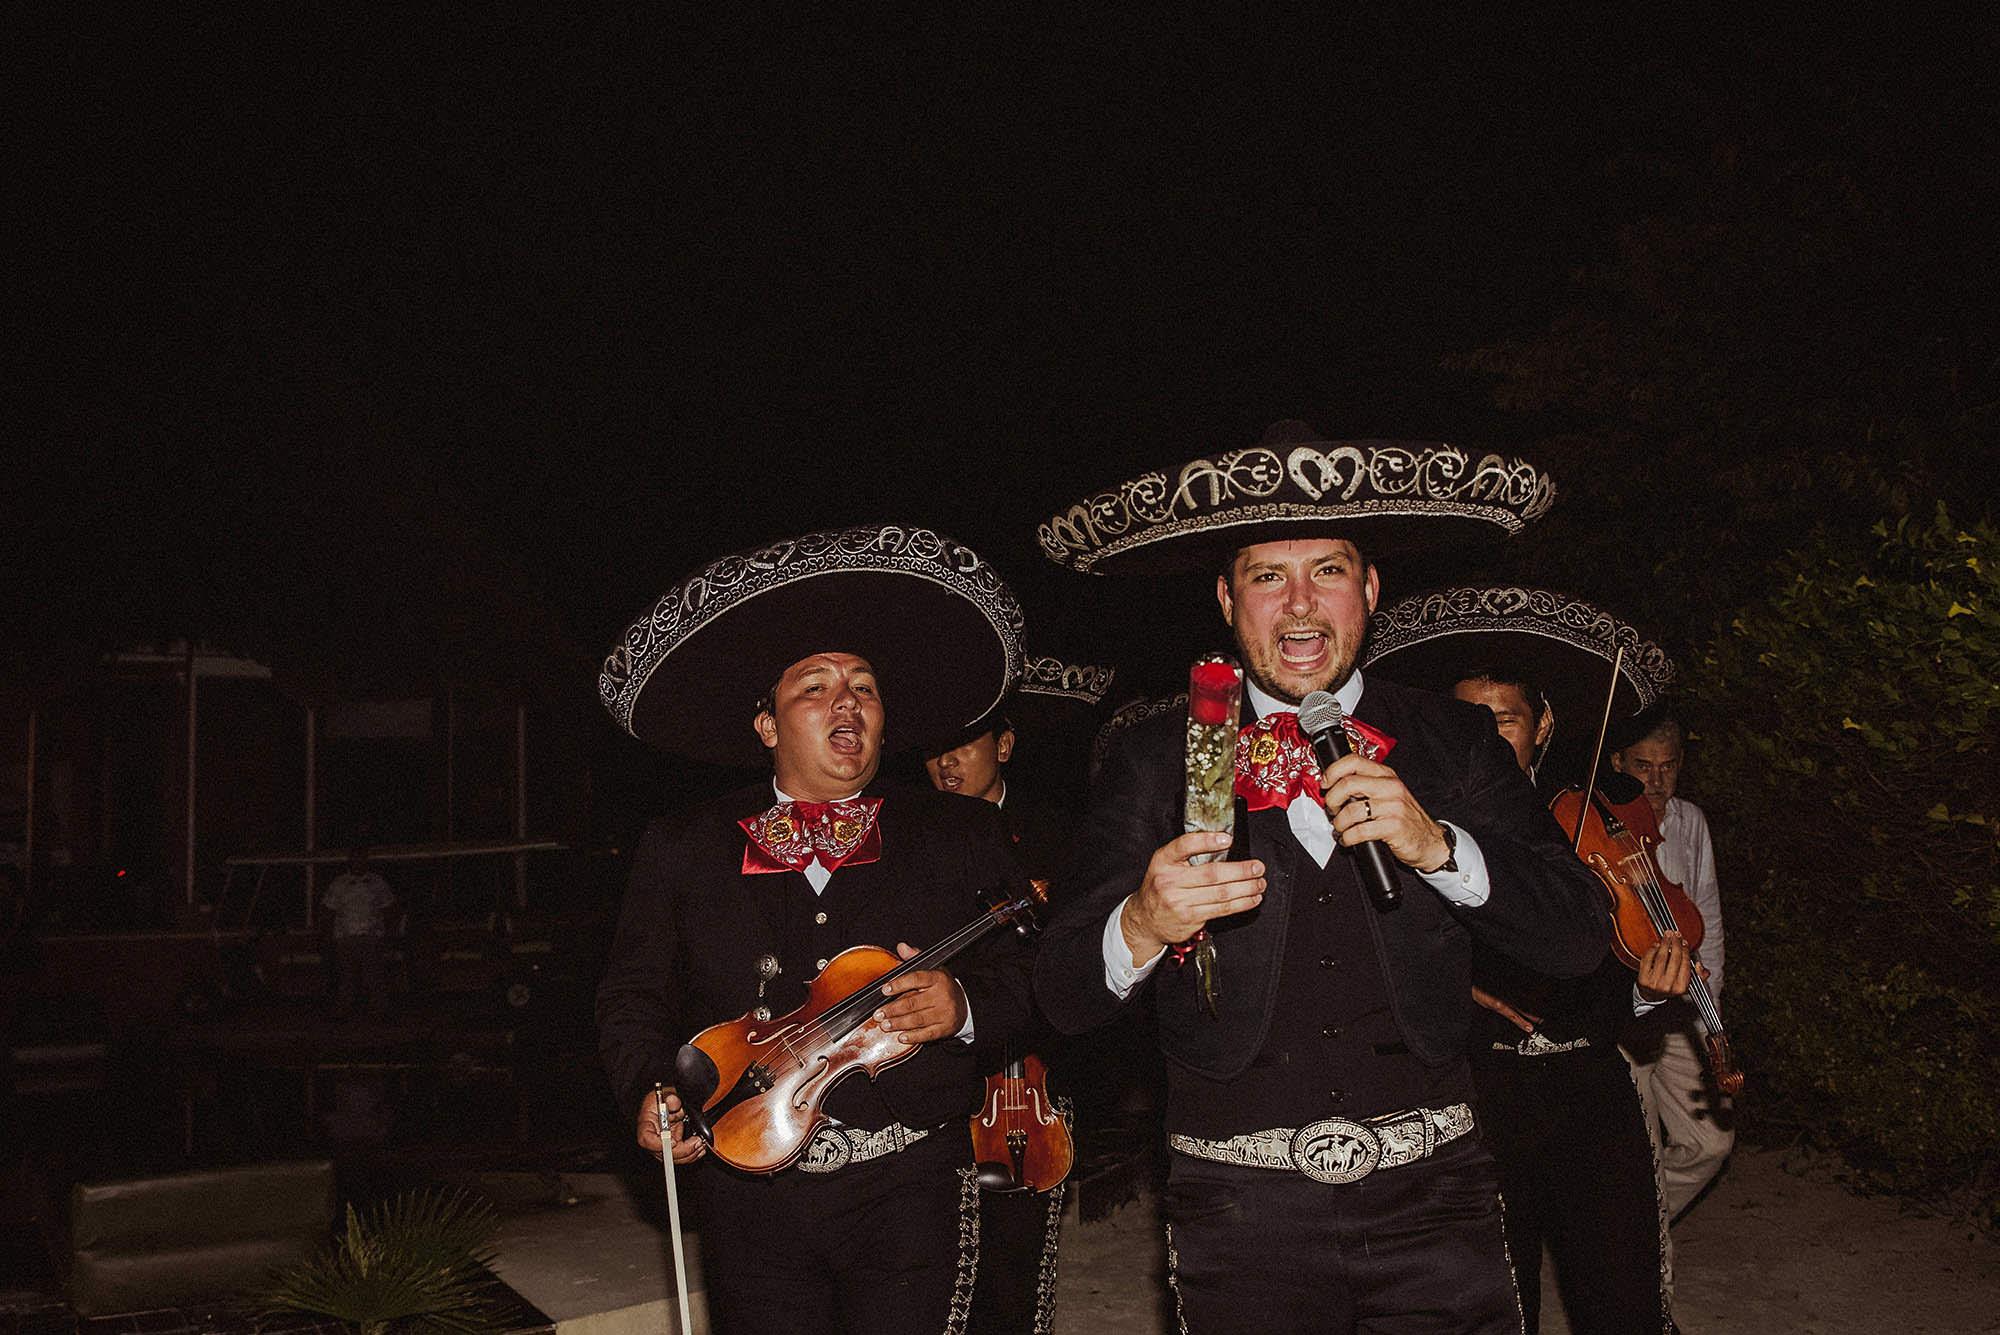 Wedding playa del carmen planner destination mexico magali espinosa51-WEB.jpg